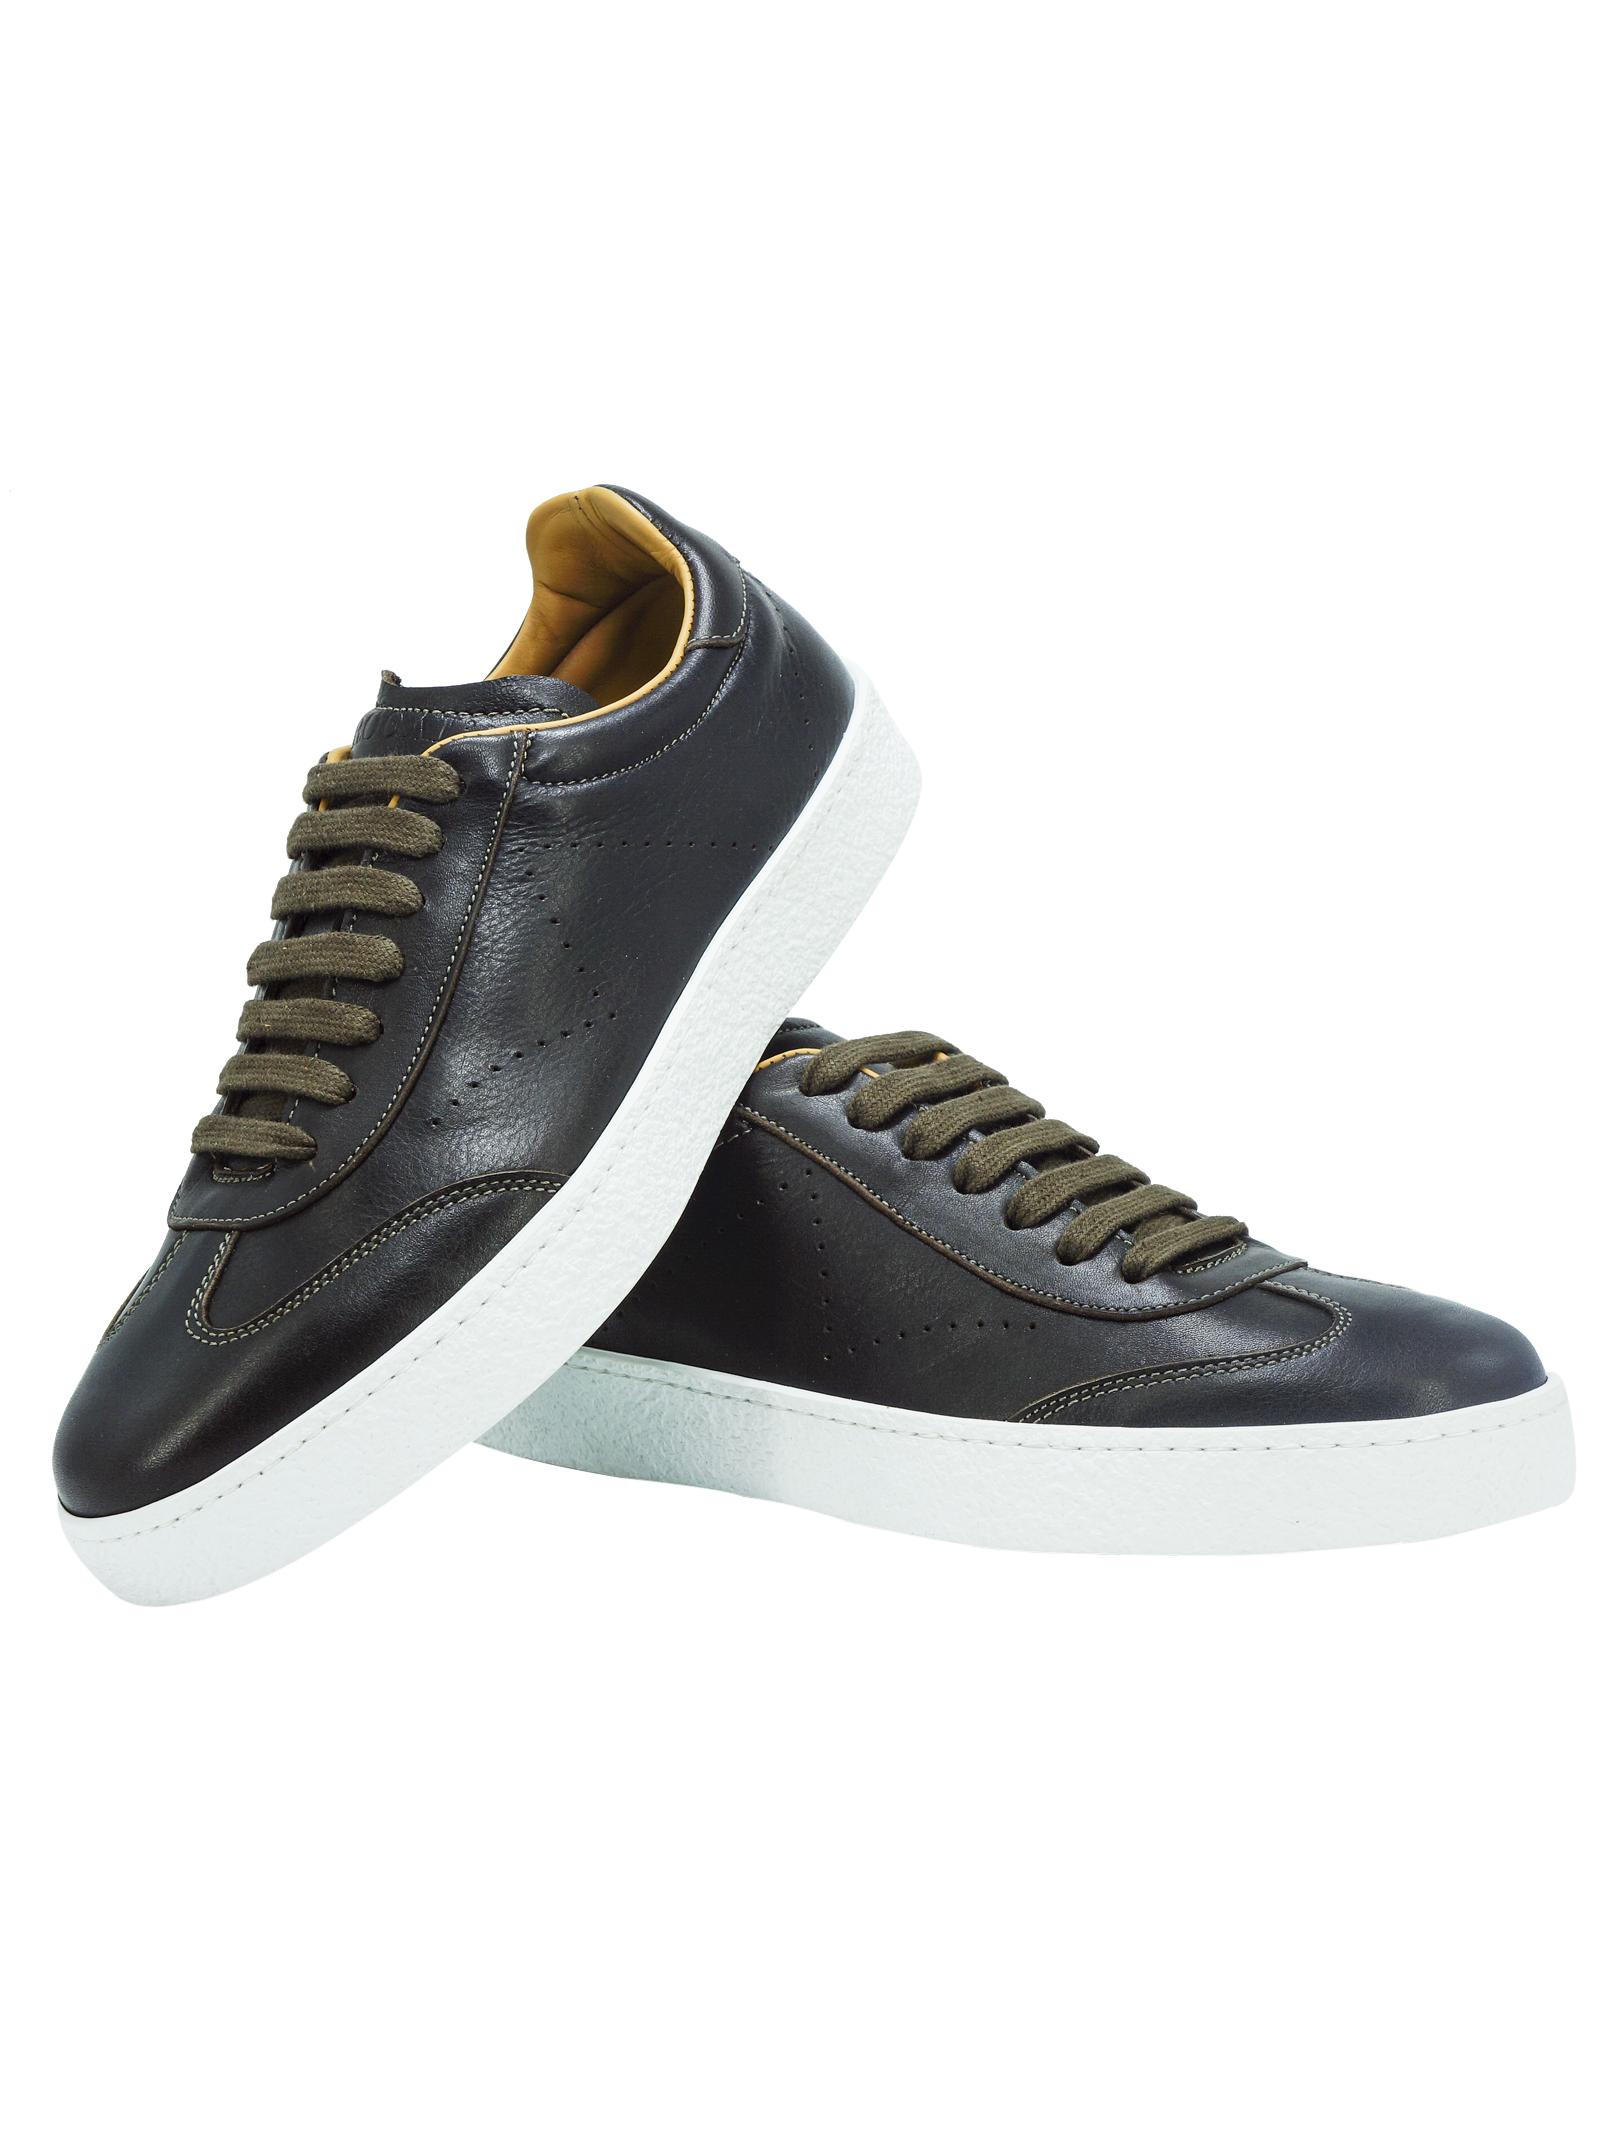 Sneakers Uomo in Pelle Marrone Rogal's | Sneakers | PAND2MORO